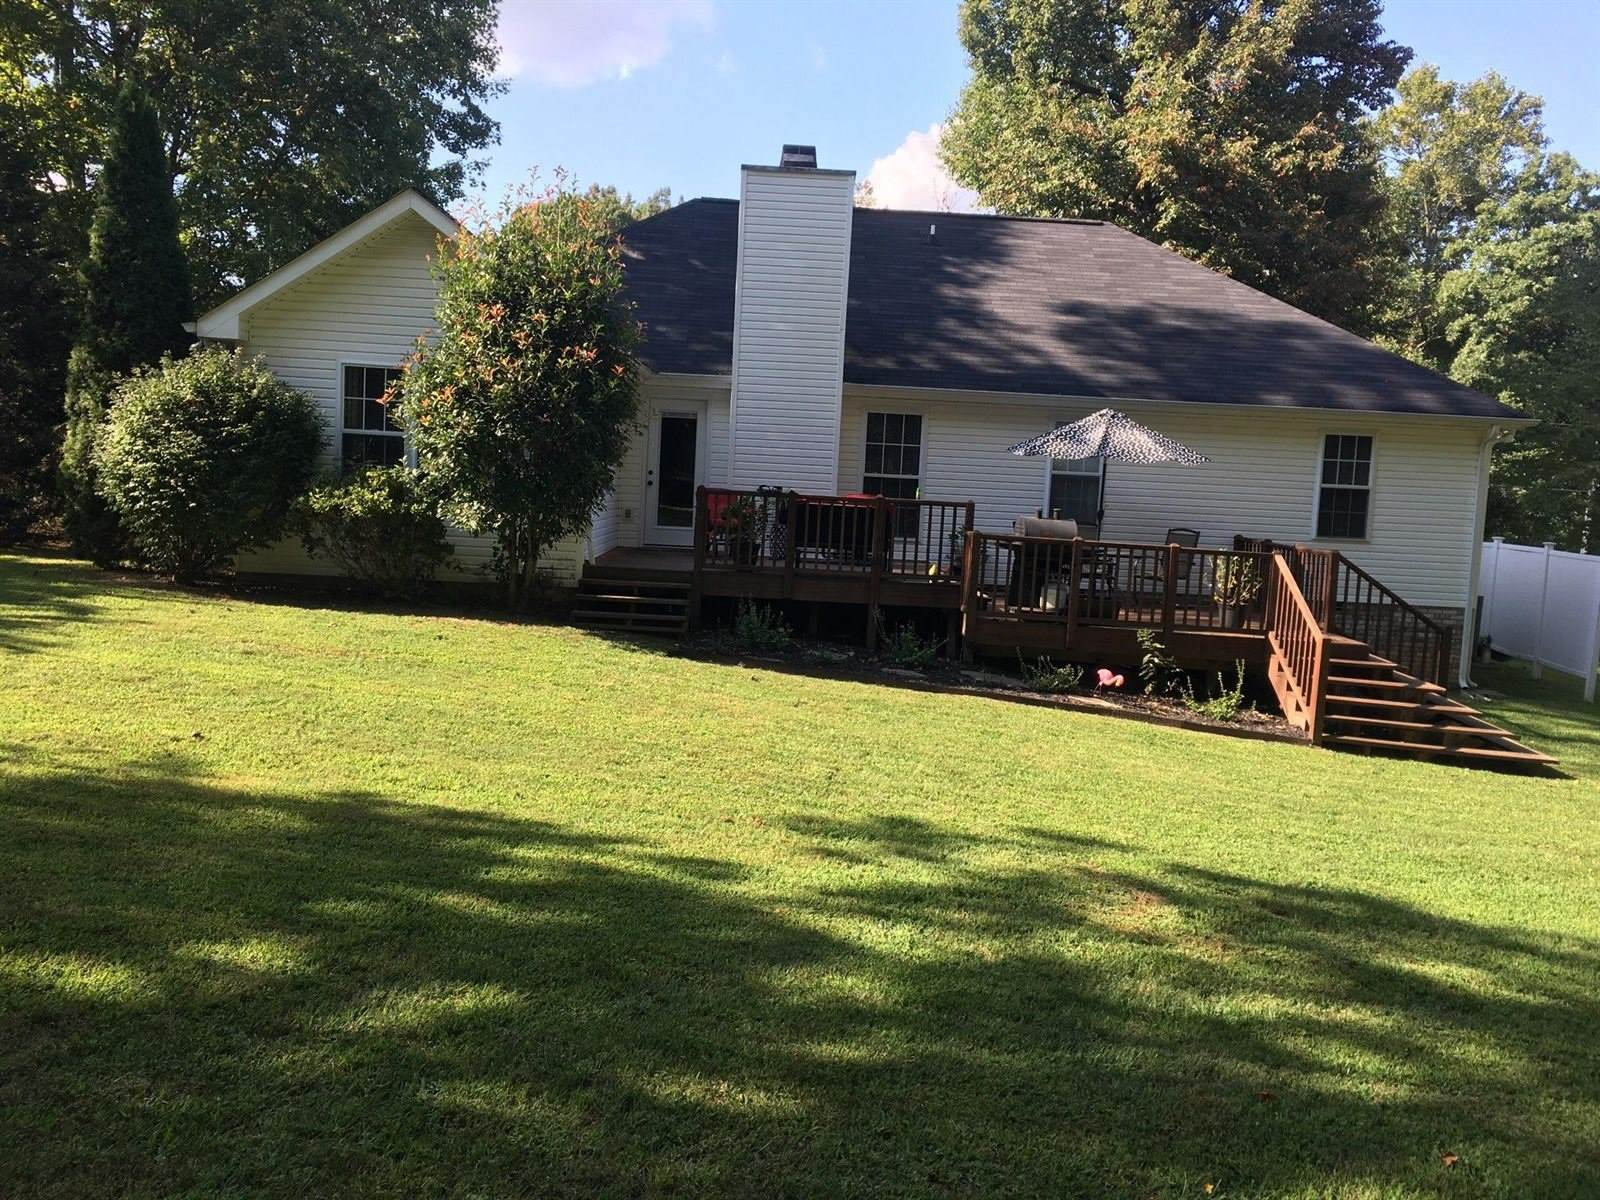 3456 Eastwood Dr, Clarksville, TN 37043